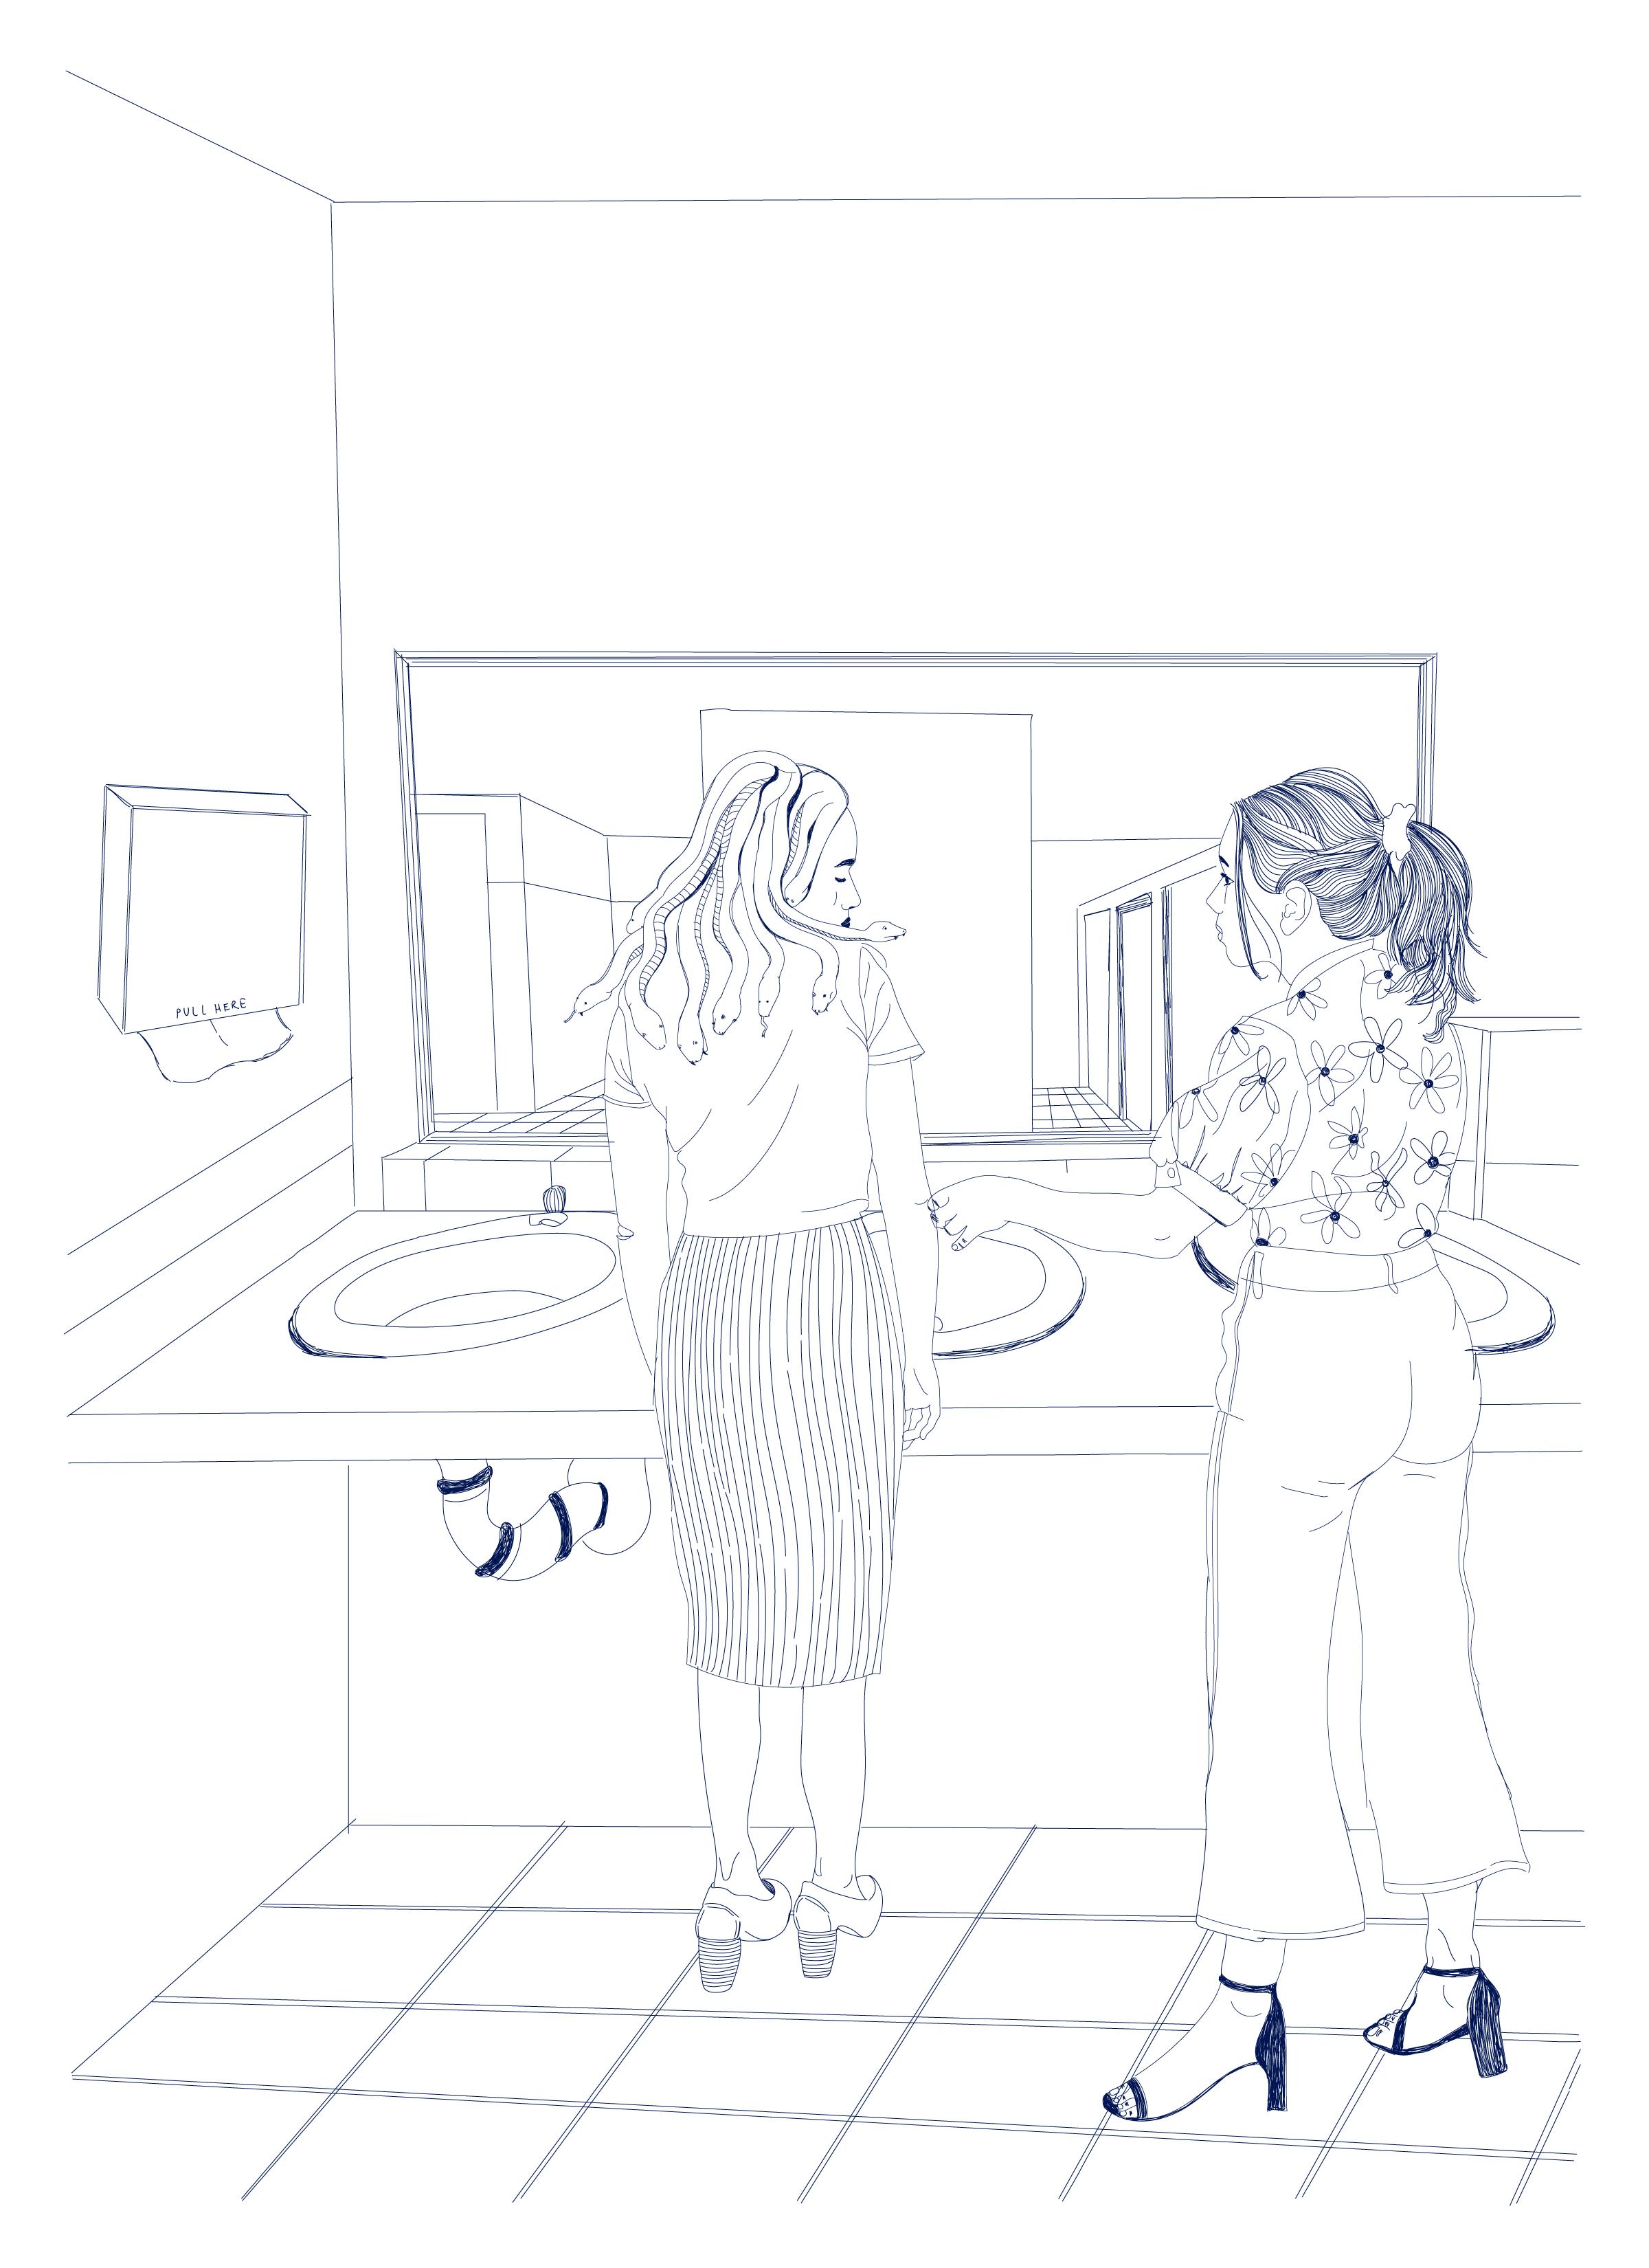 blueArtboard 4.png